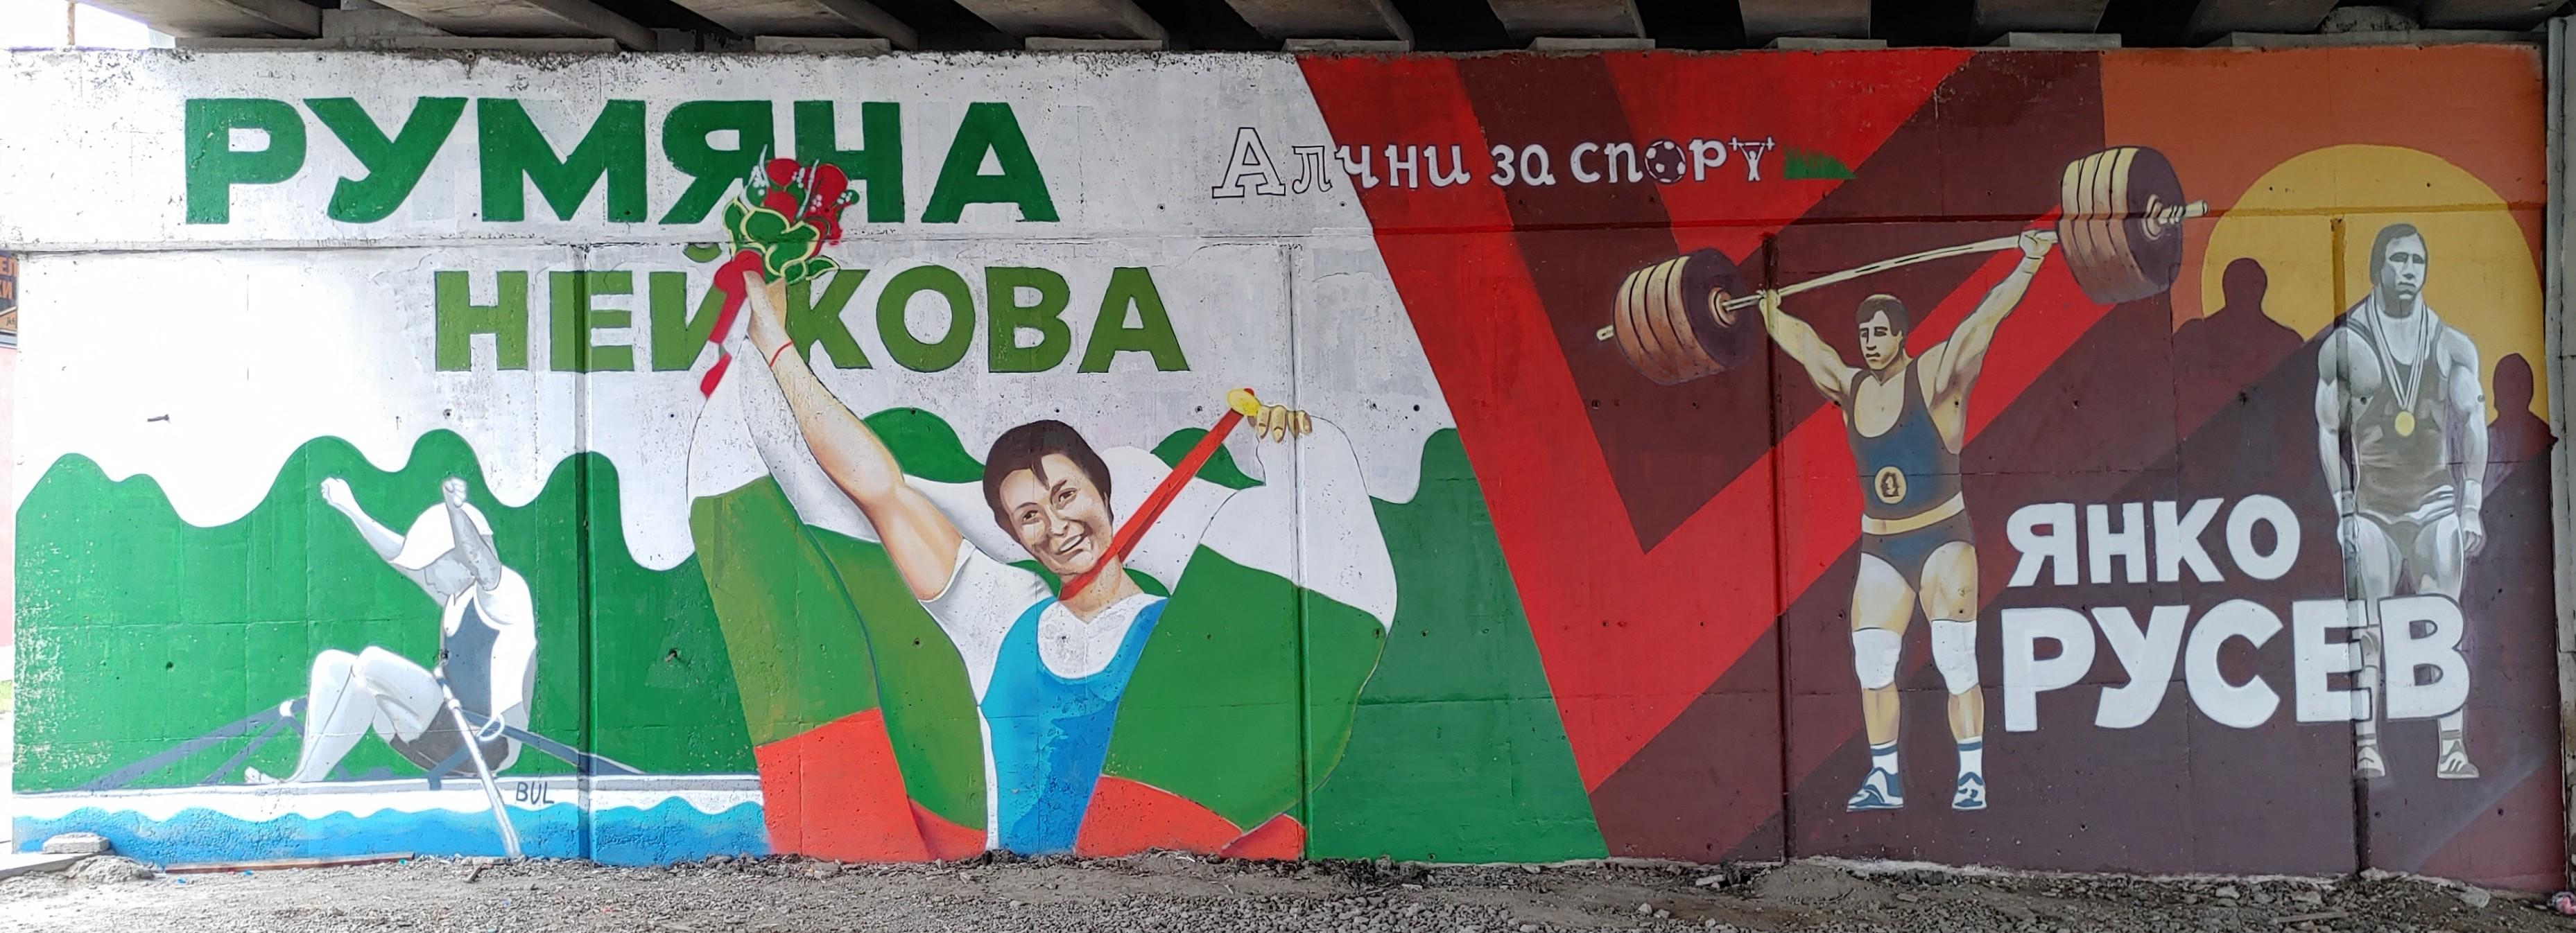 Румяна Нейкова и Янко Русев графит